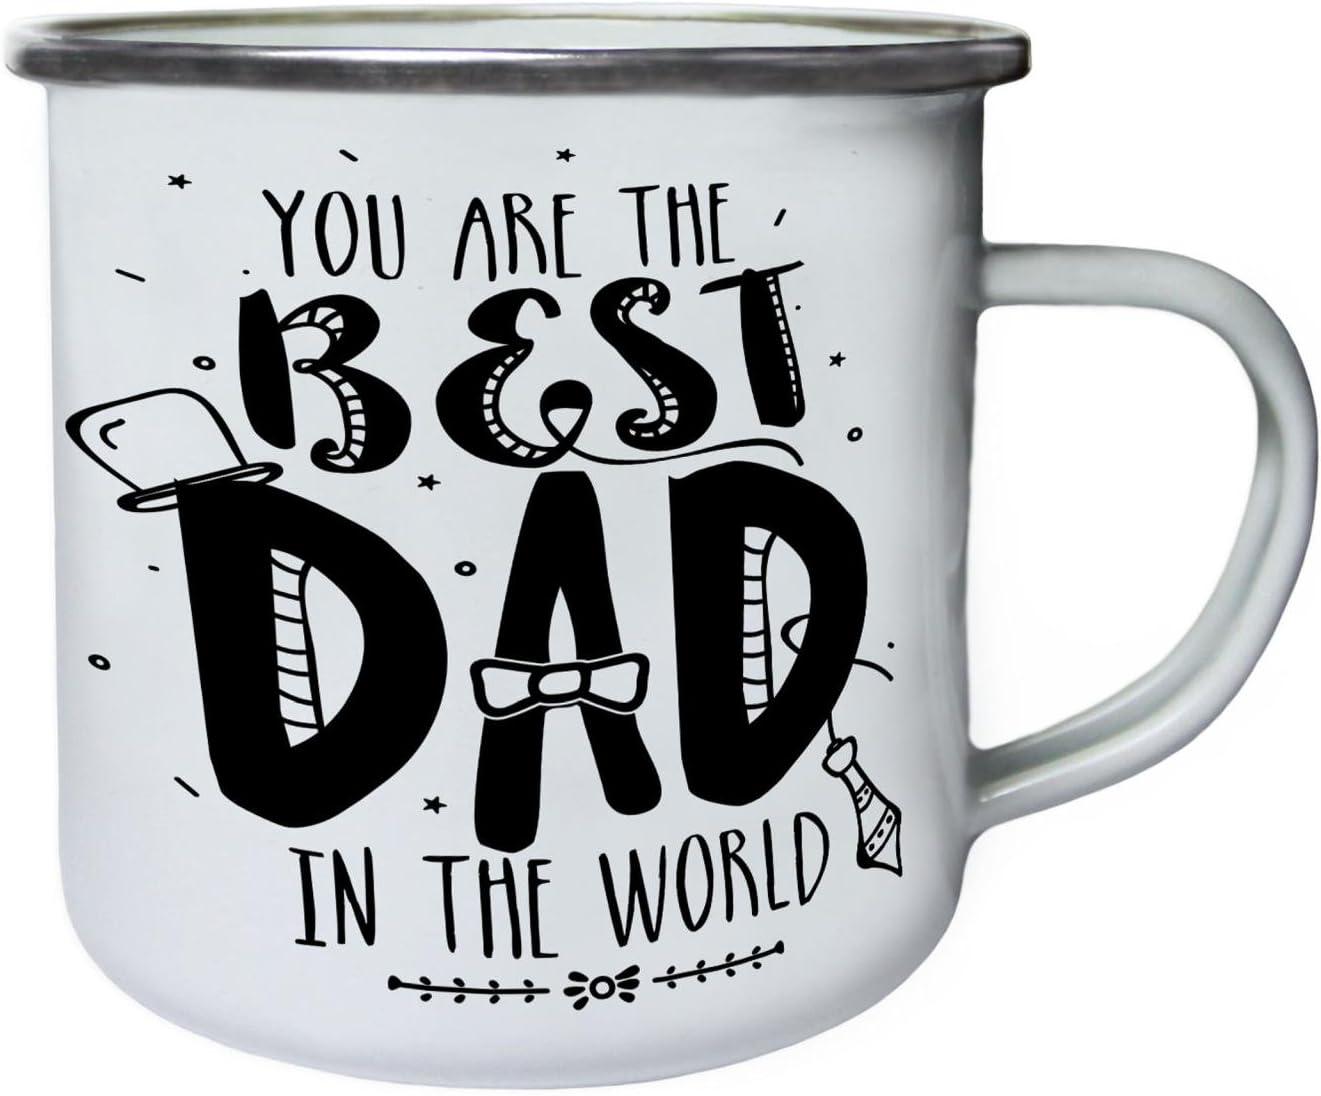 Enamel 10oz Mug b658e Best Dad In The World Father/'s Day  Retro,Tin